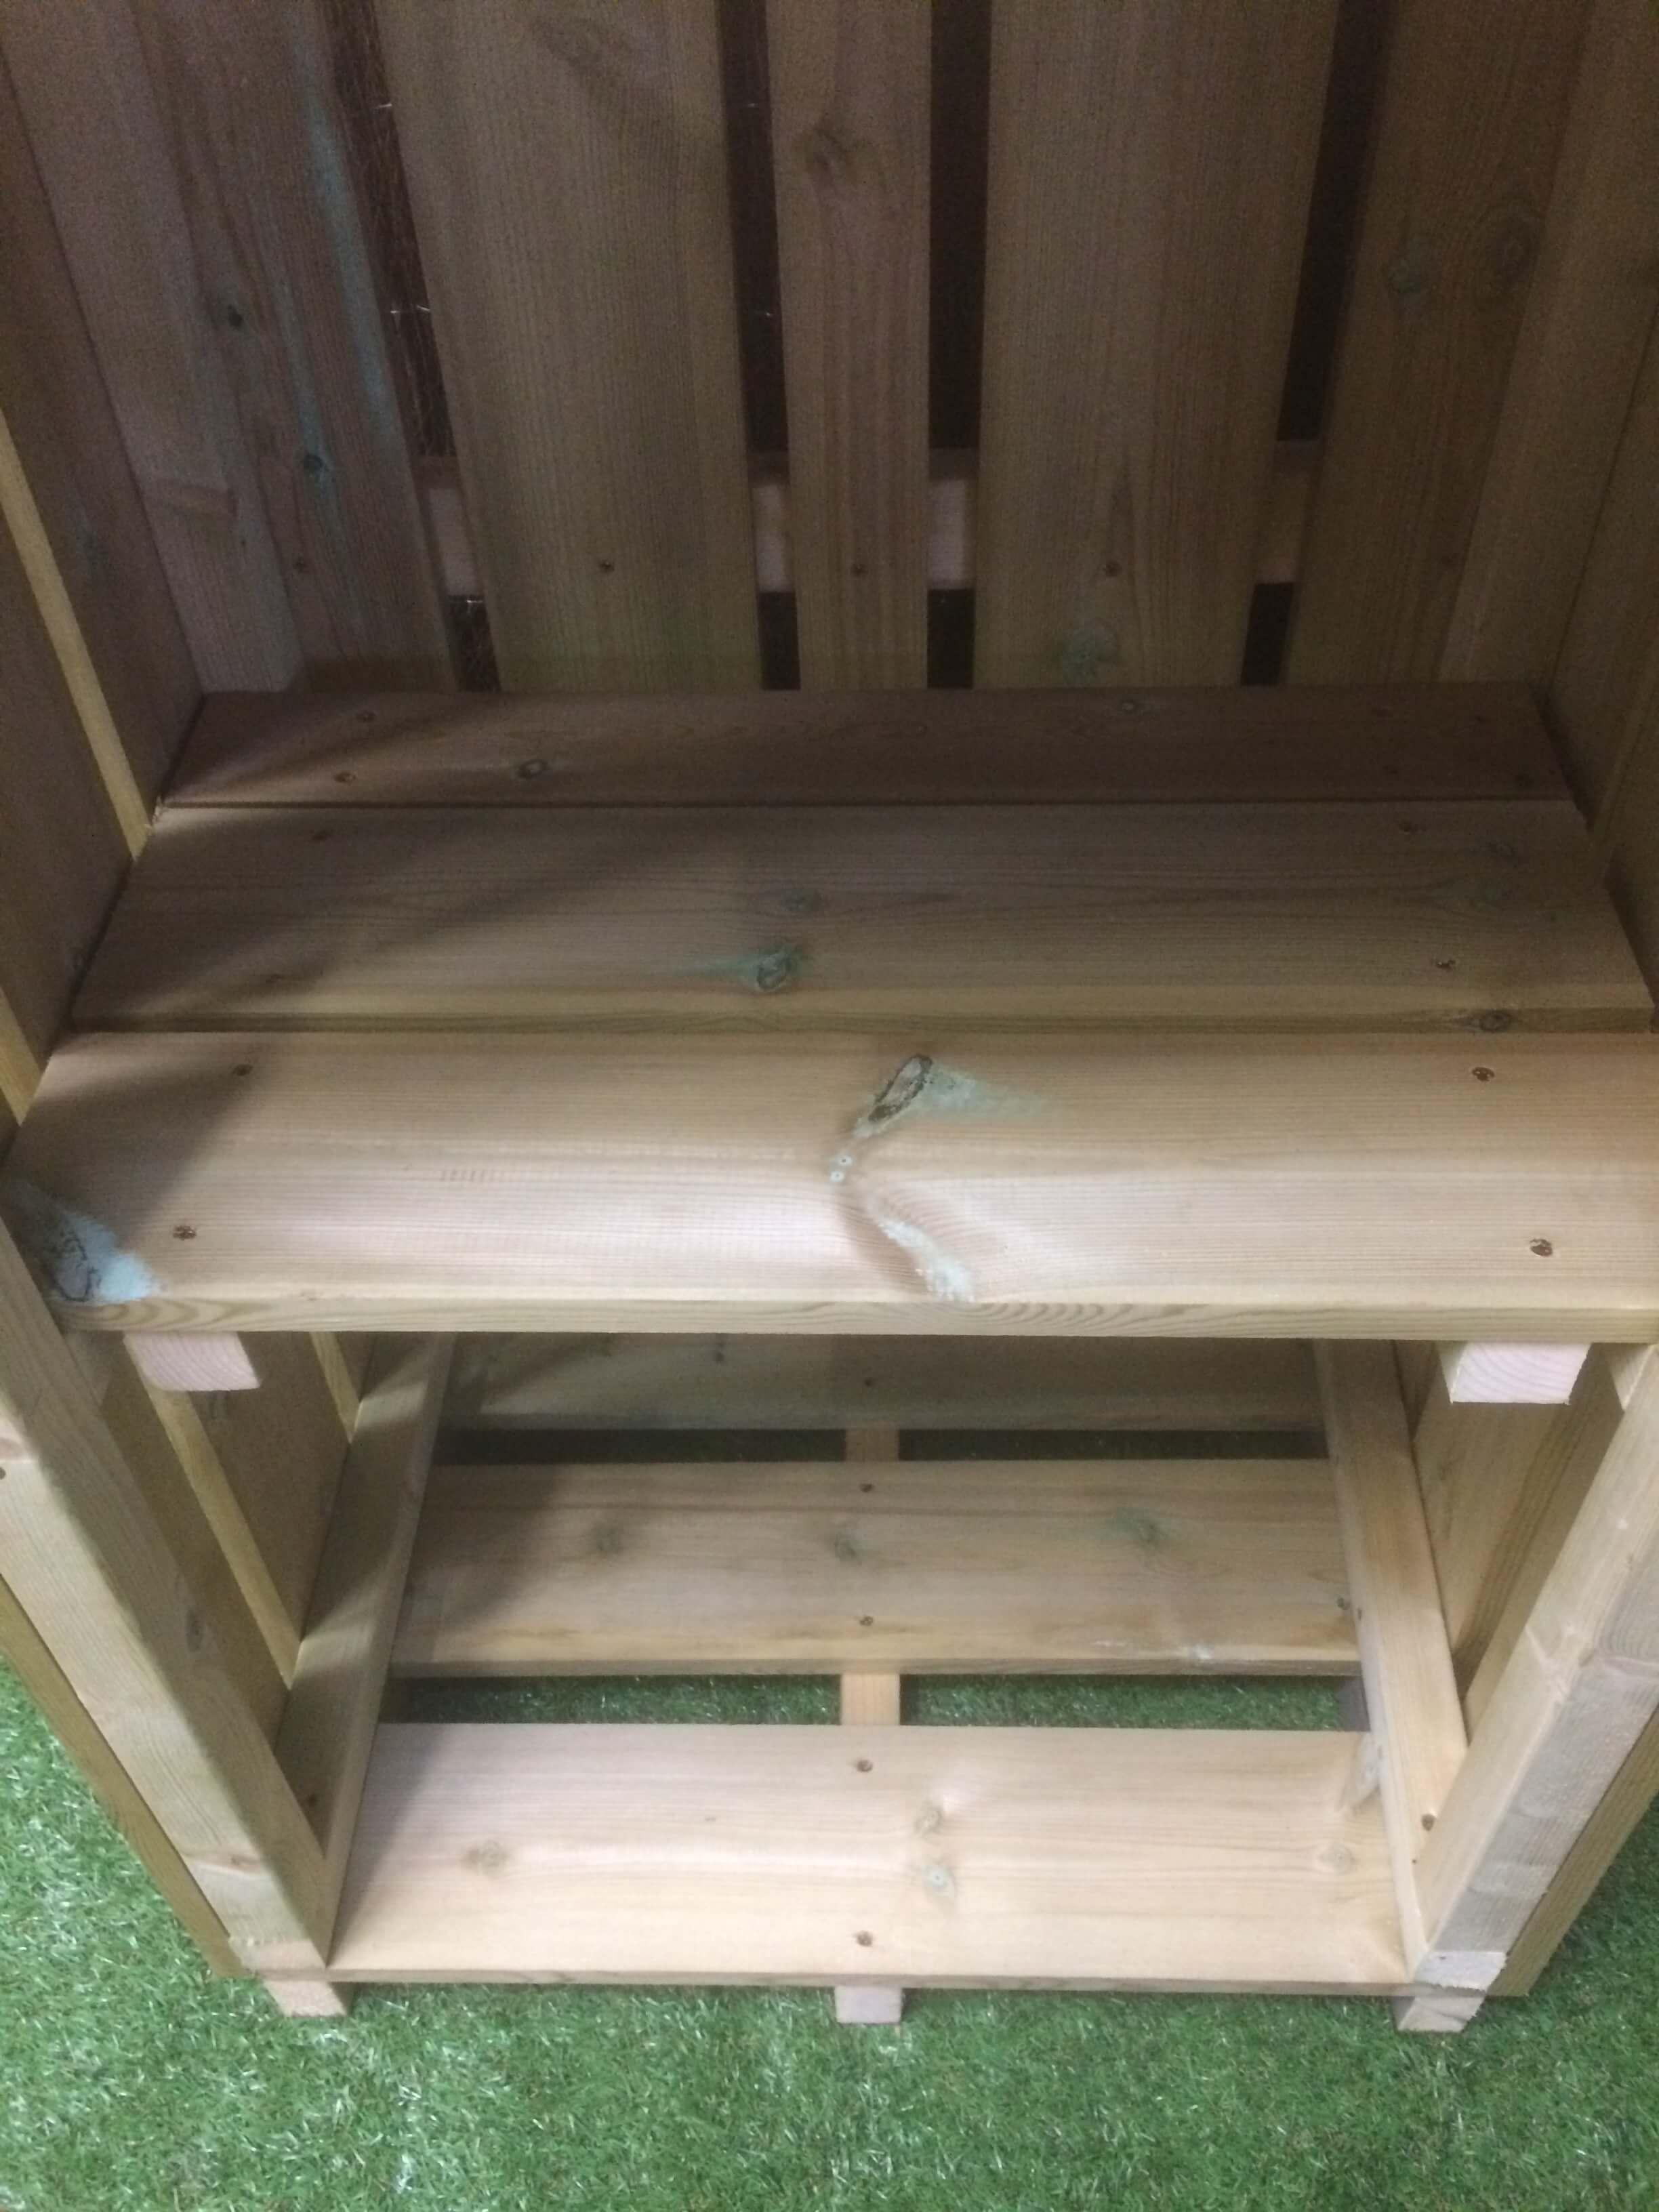 Cadworthy Recycling Box Store Outdoor Wooden Garden